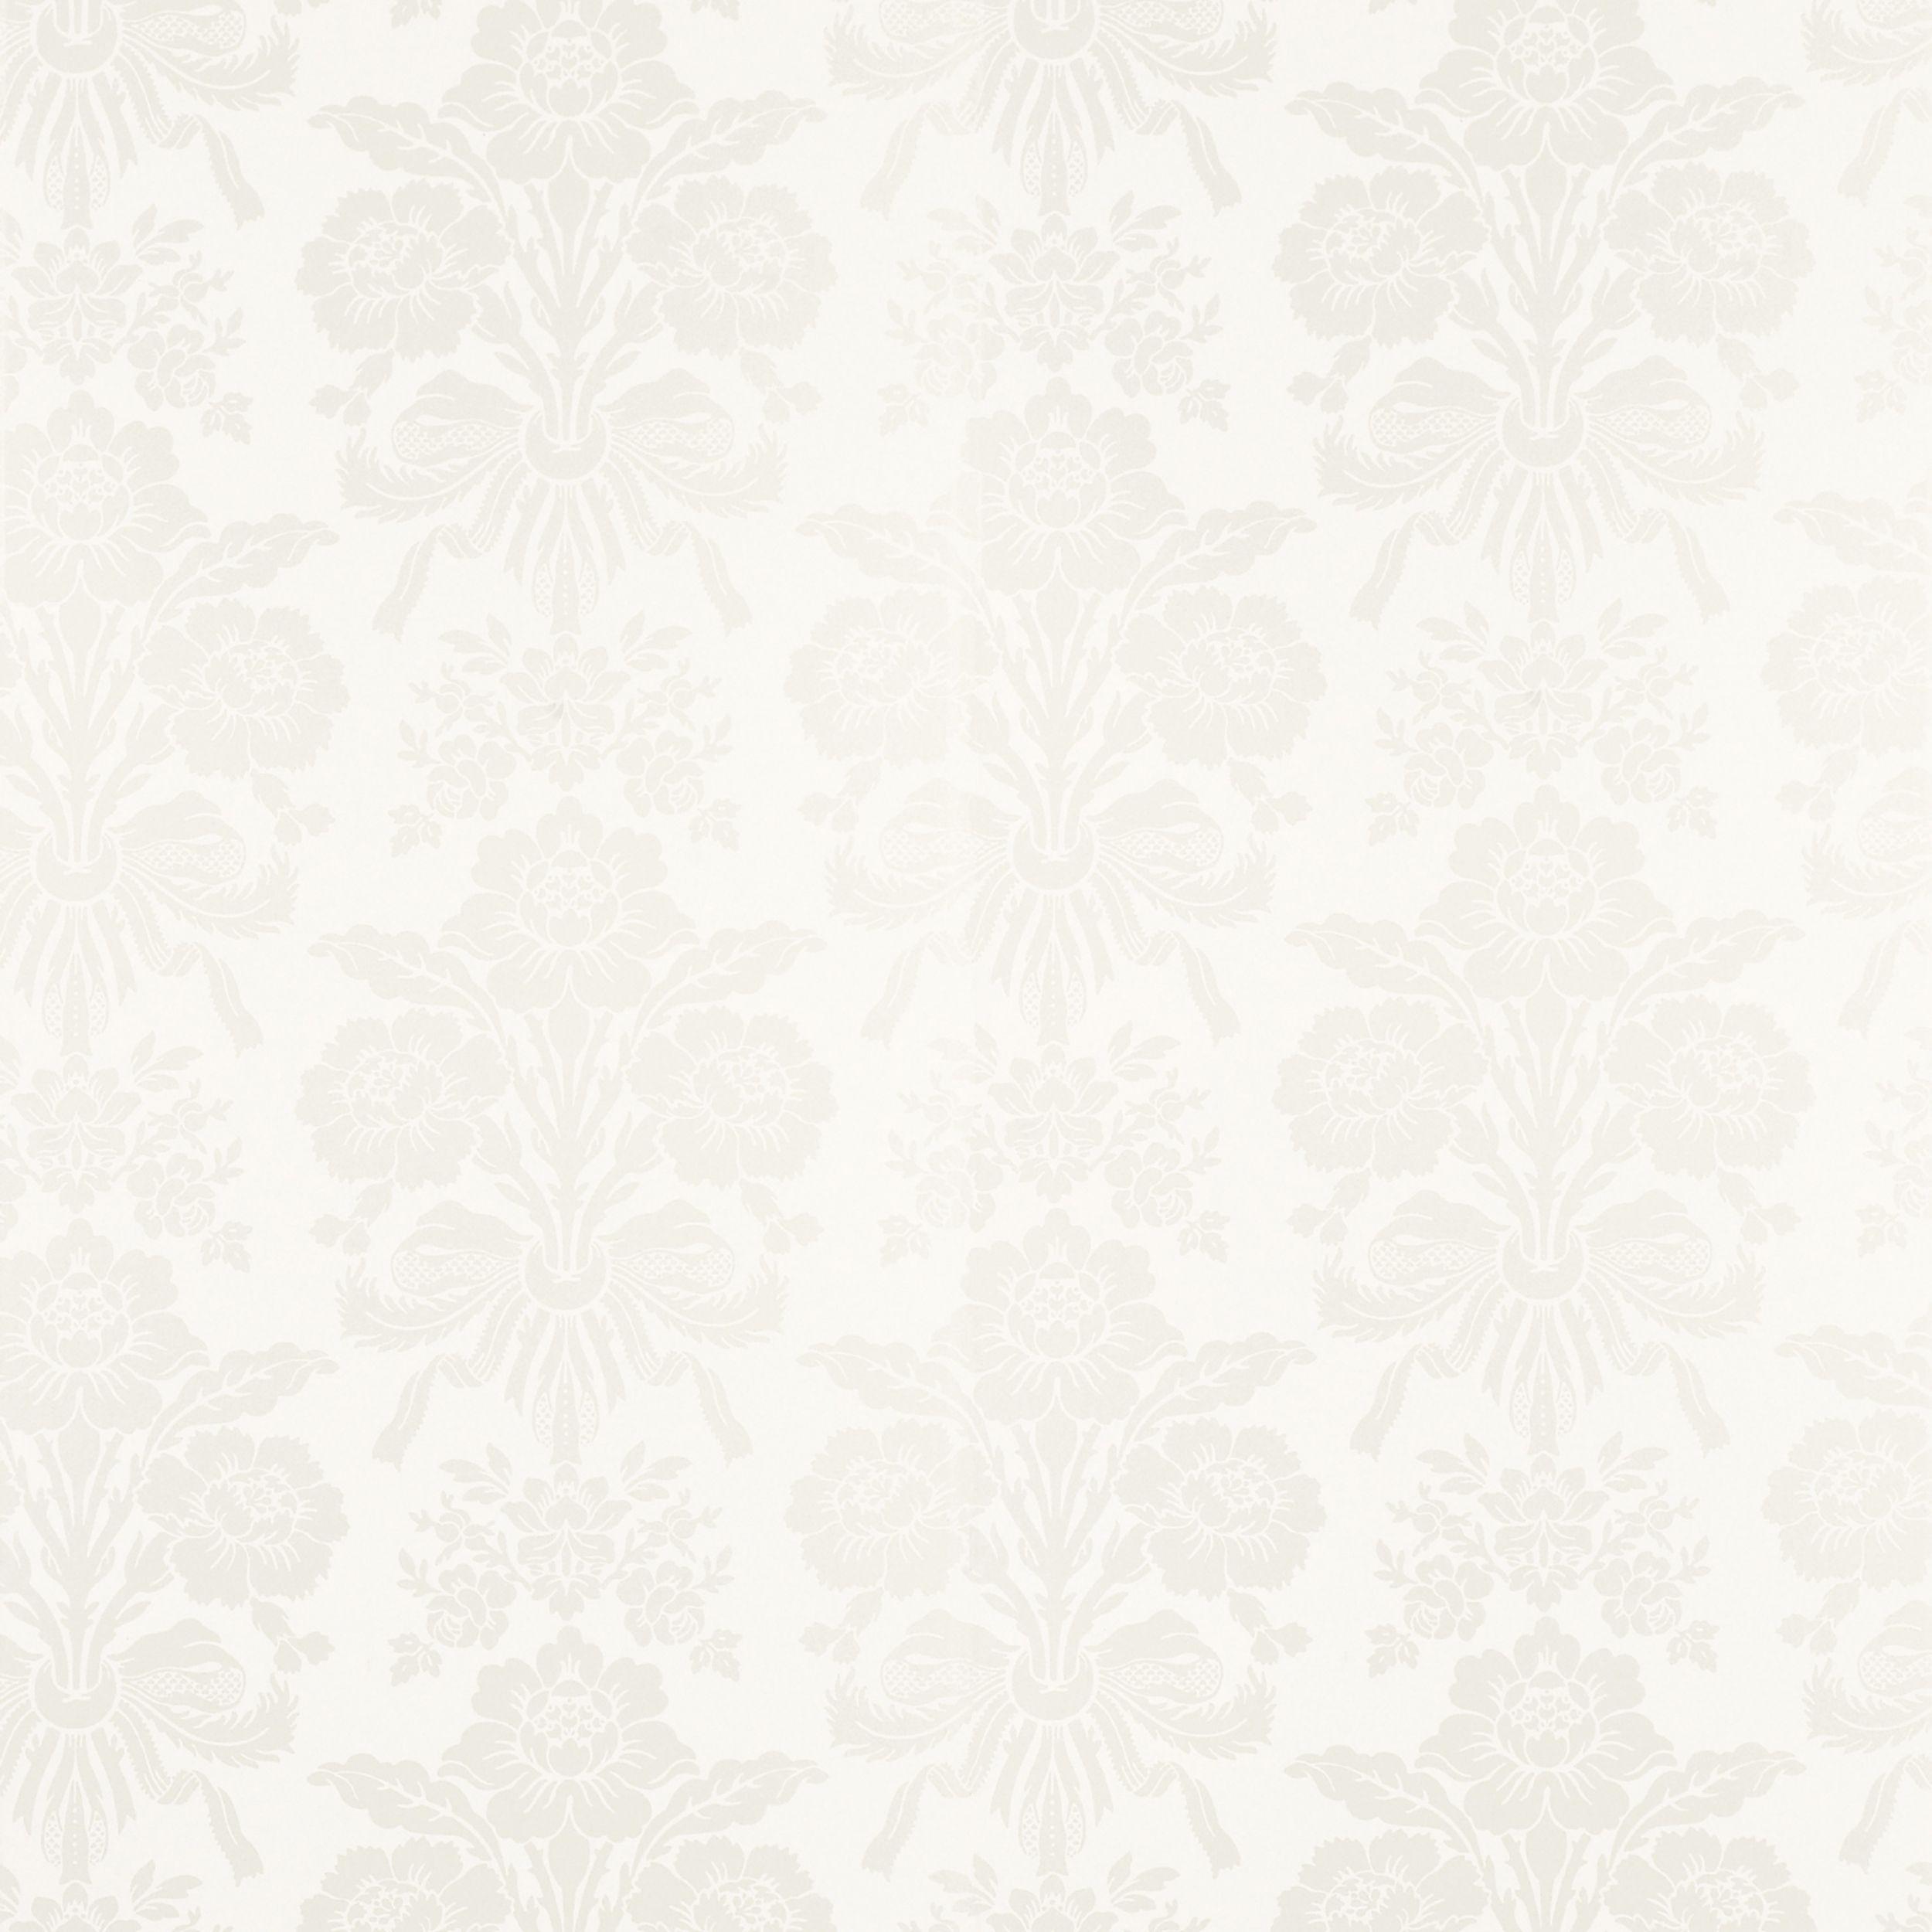 tatton white damask wallpaper laura ashley pookie 39 s. Black Bedroom Furniture Sets. Home Design Ideas